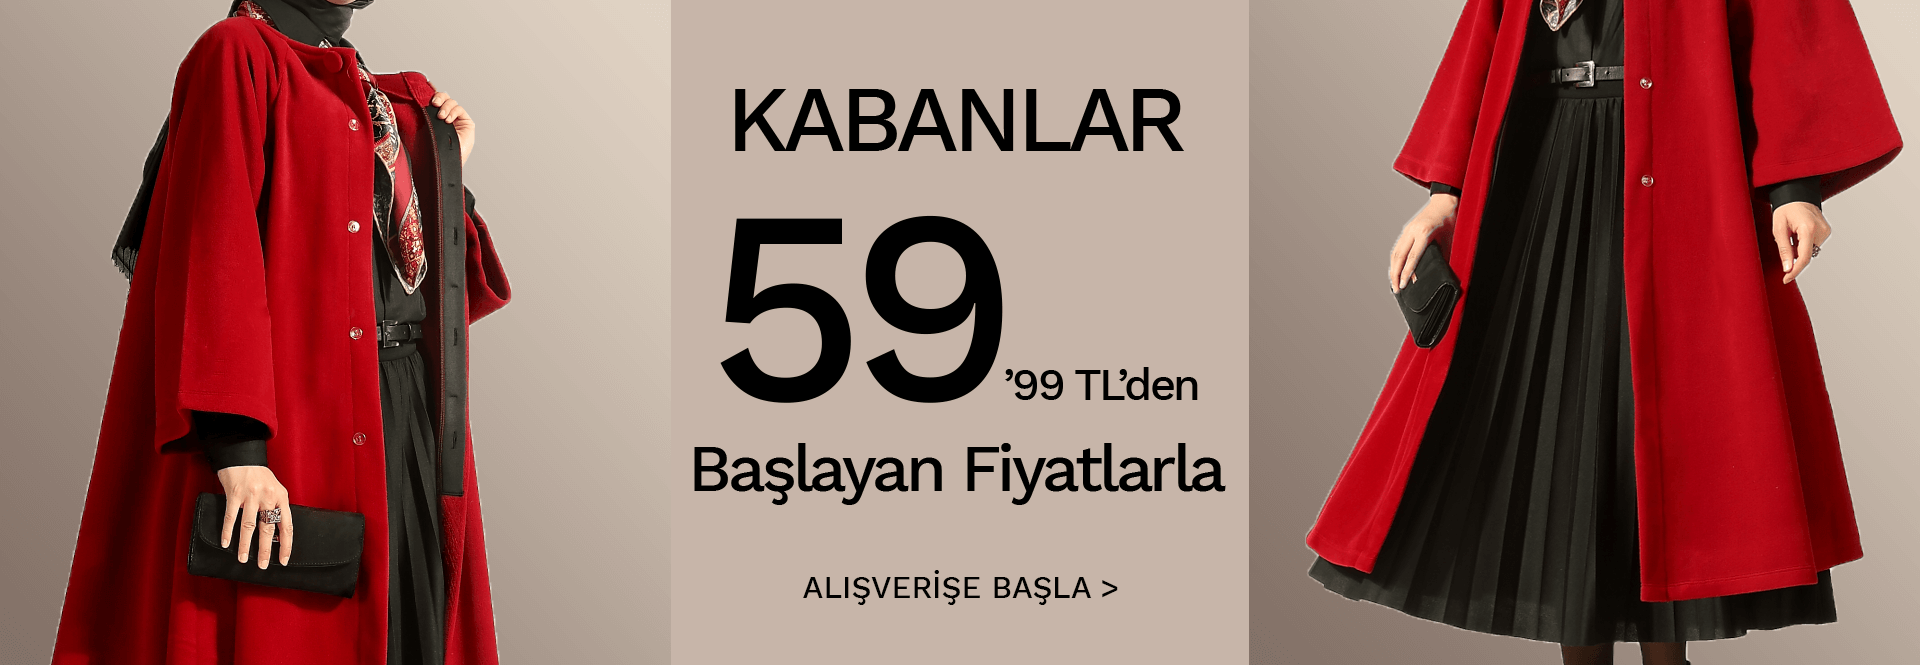 Kabanlar 59,99 tl